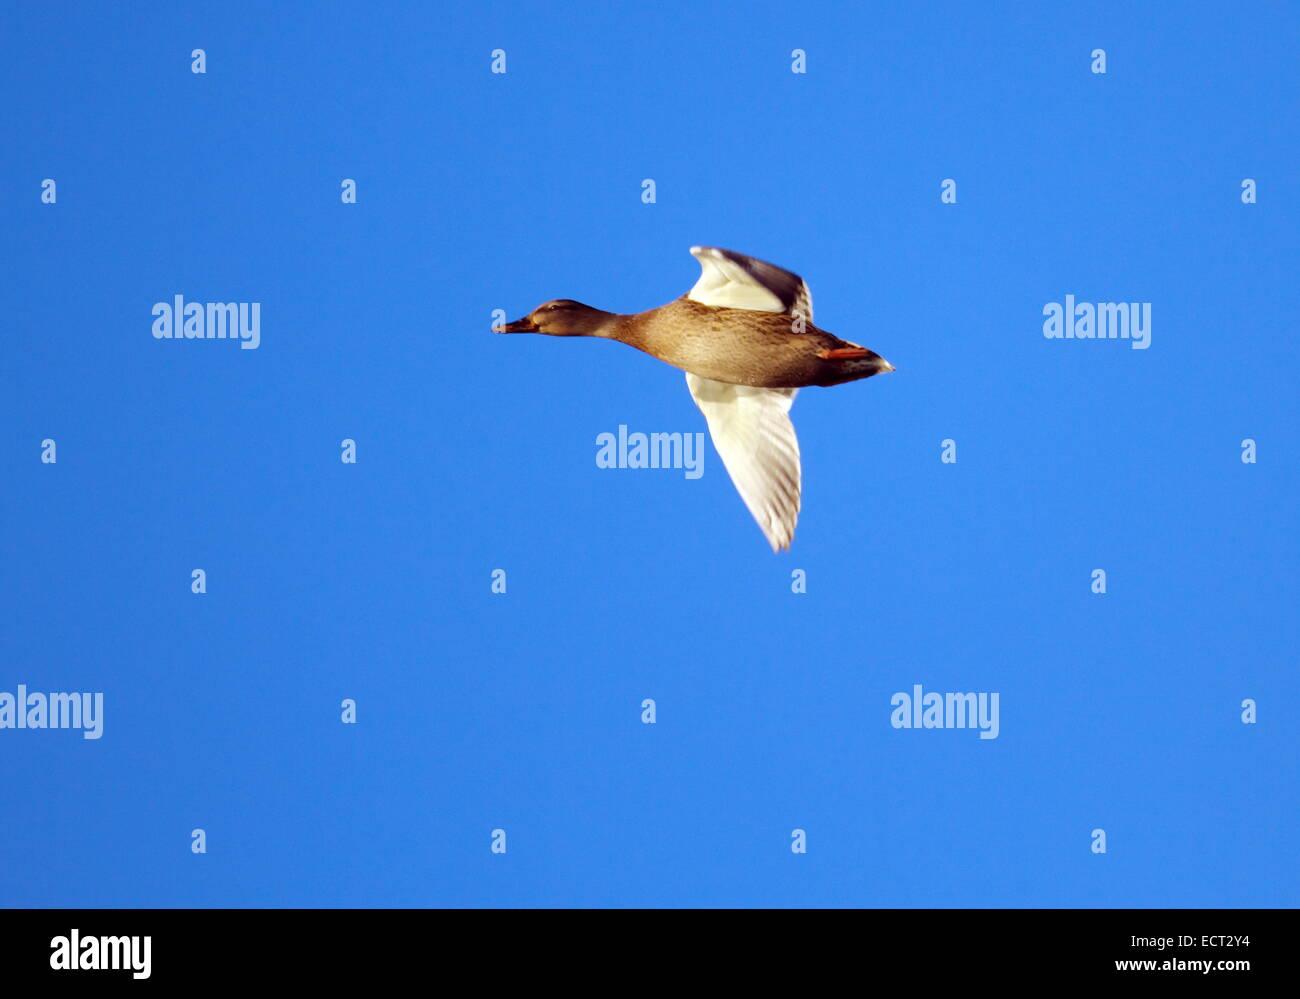 Female mallard duck flying into deep blue sky by sunset - Stock Image